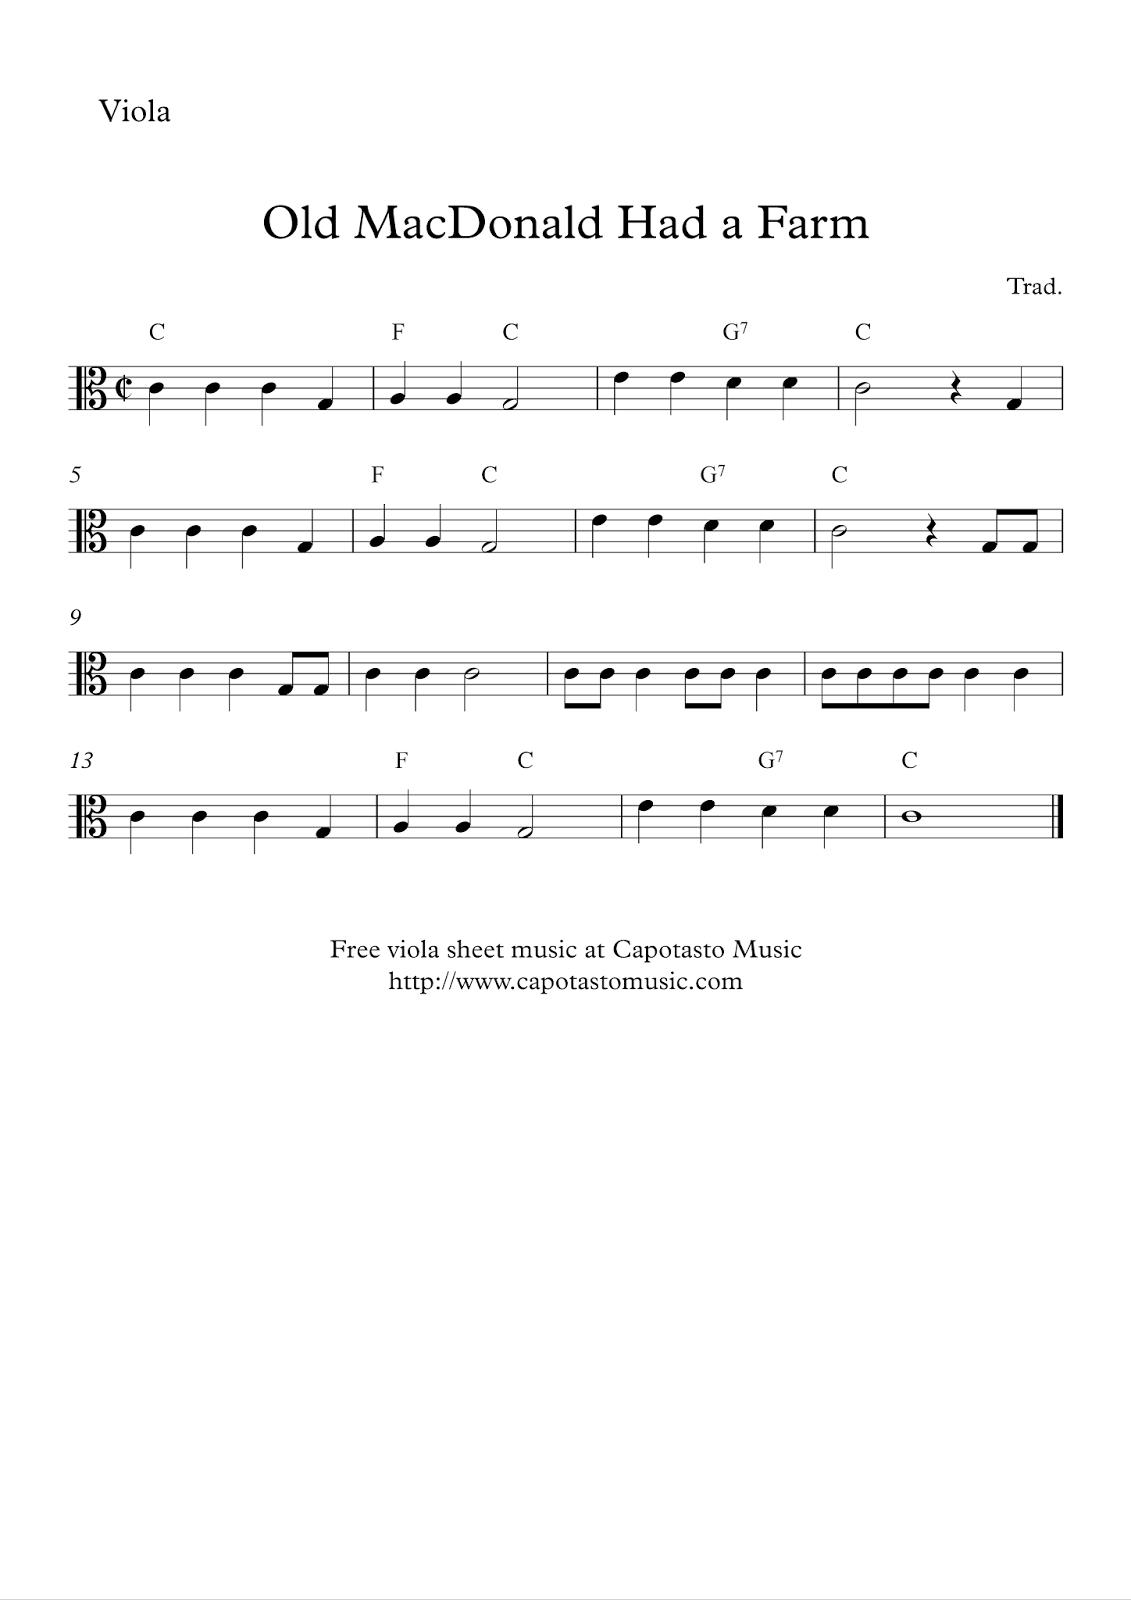 Free Easy Viola Sheet Music - Old Macdonald Had A Farm - Viola Sheet Music Free Printable